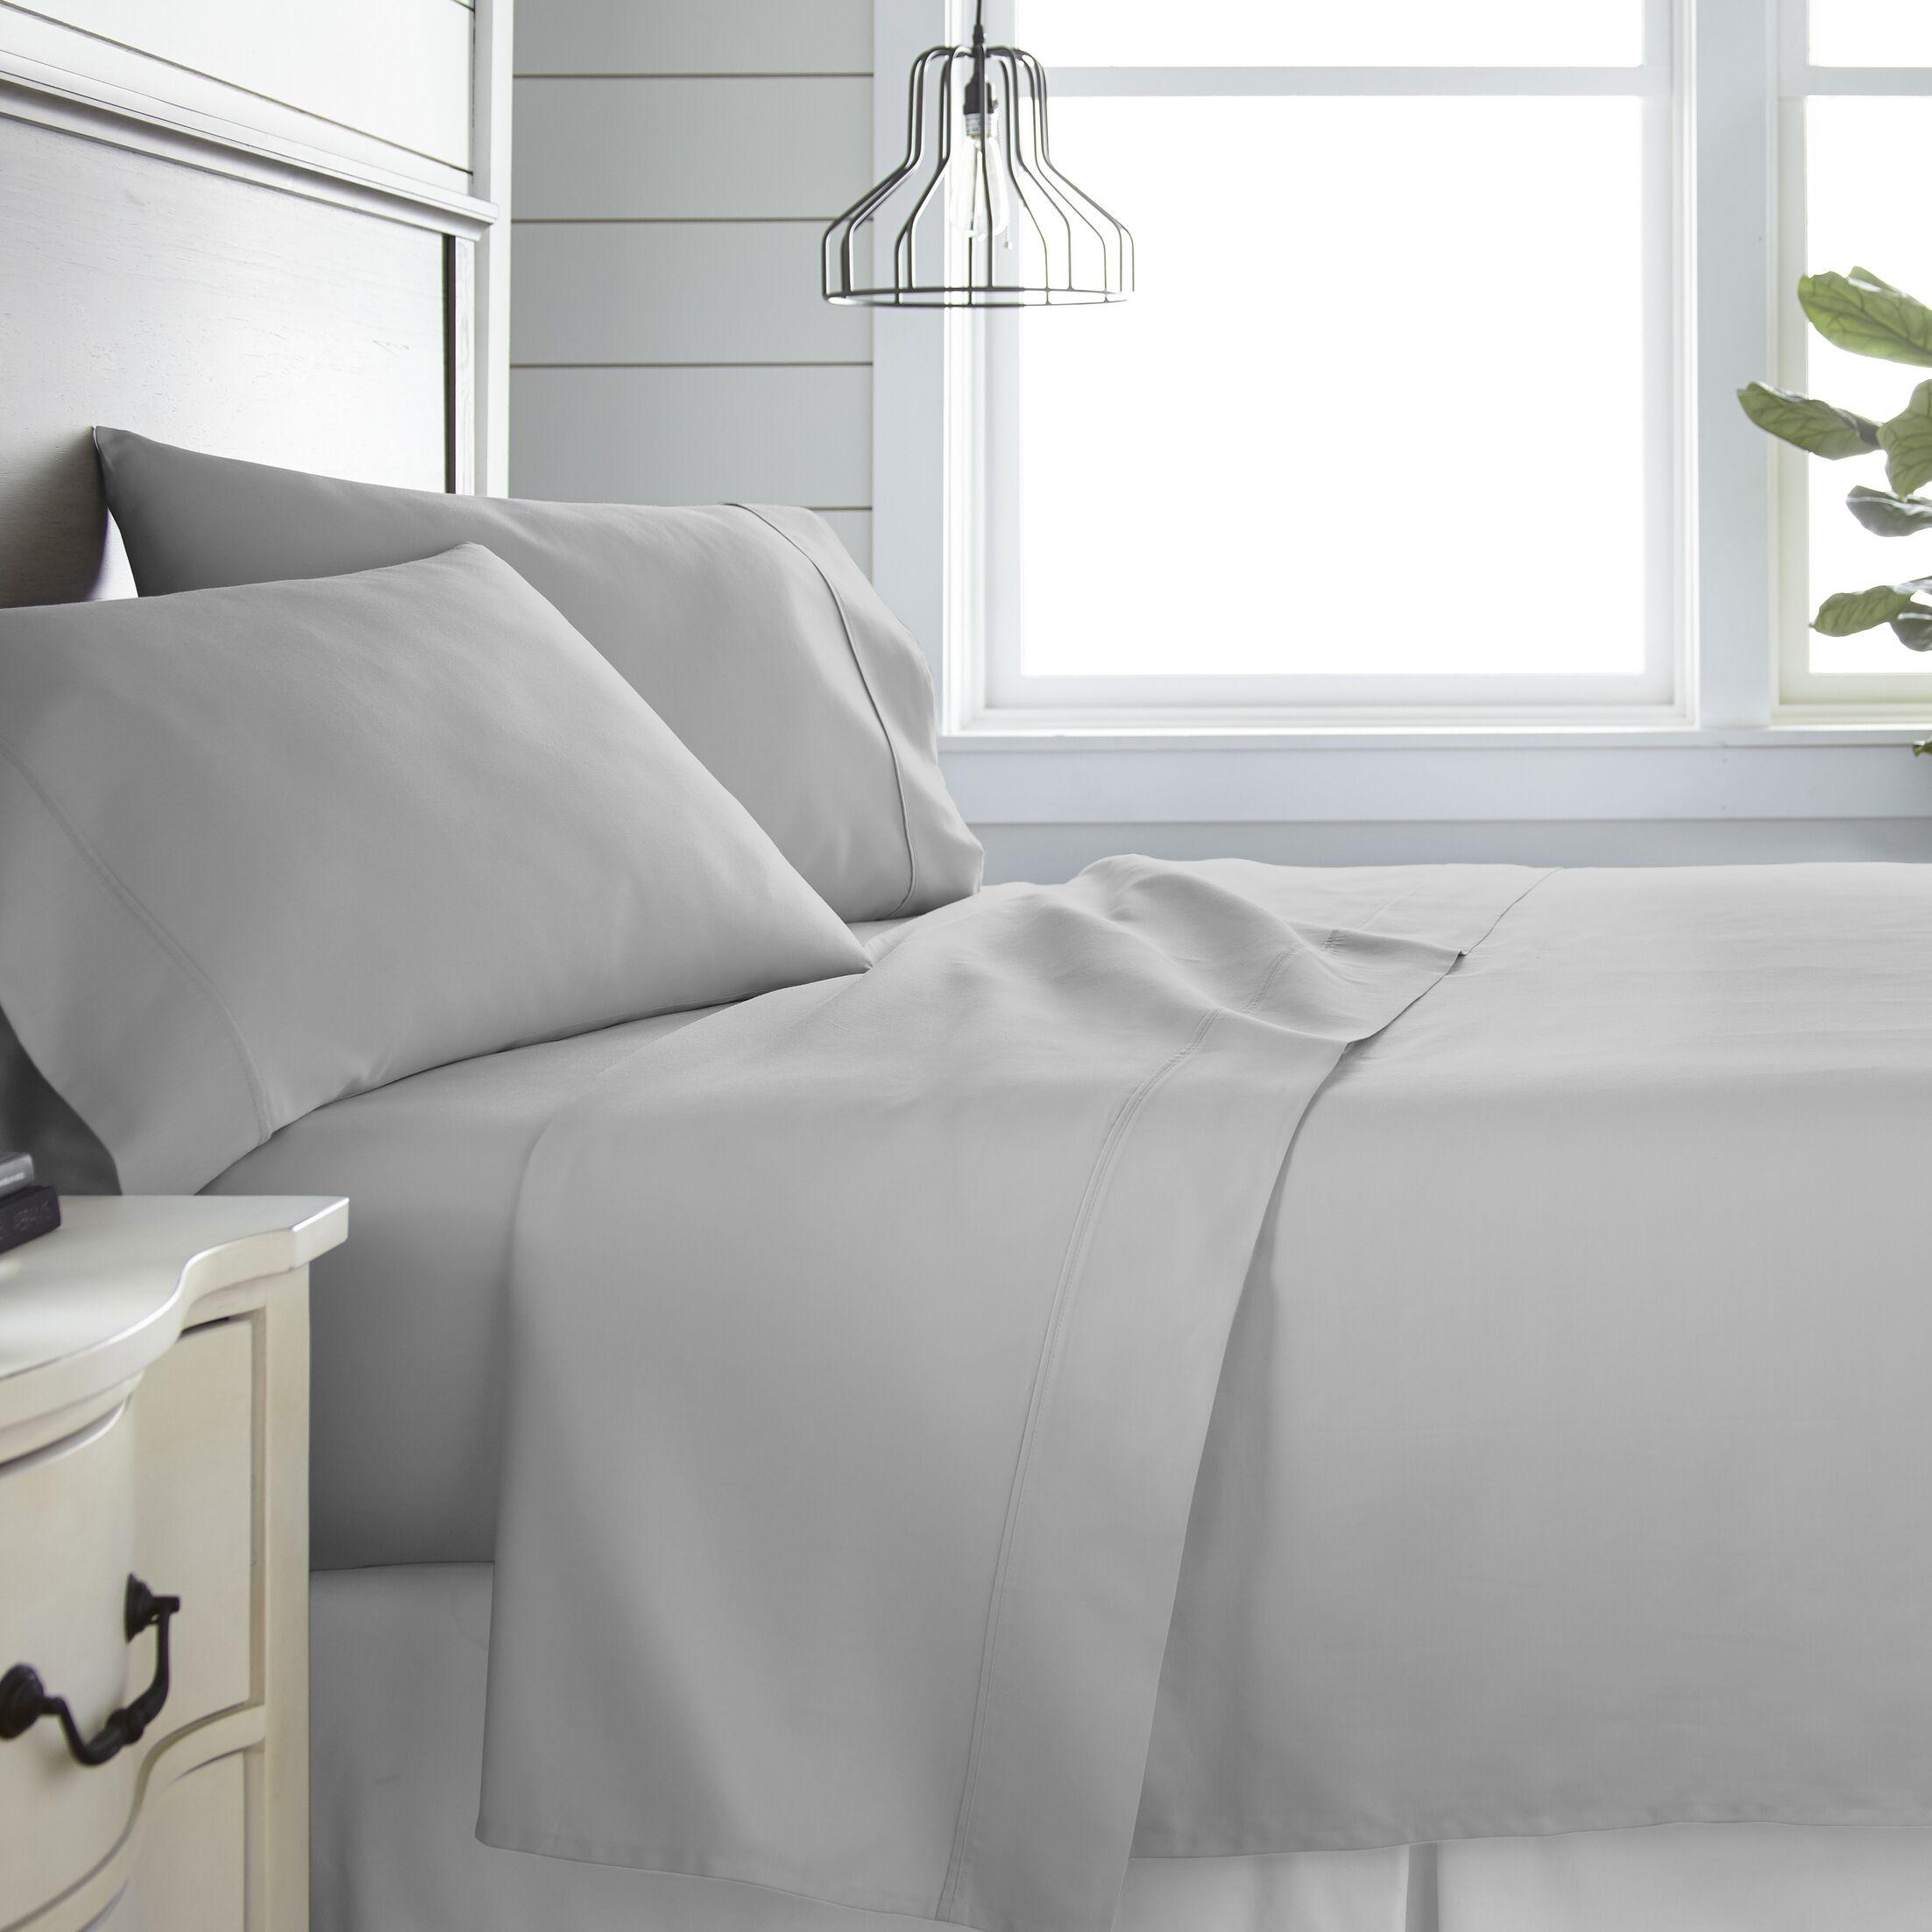 Long Ashton 300 Thread Count 100% Cotton Sheet Set Color: Light Gray, Size: Full